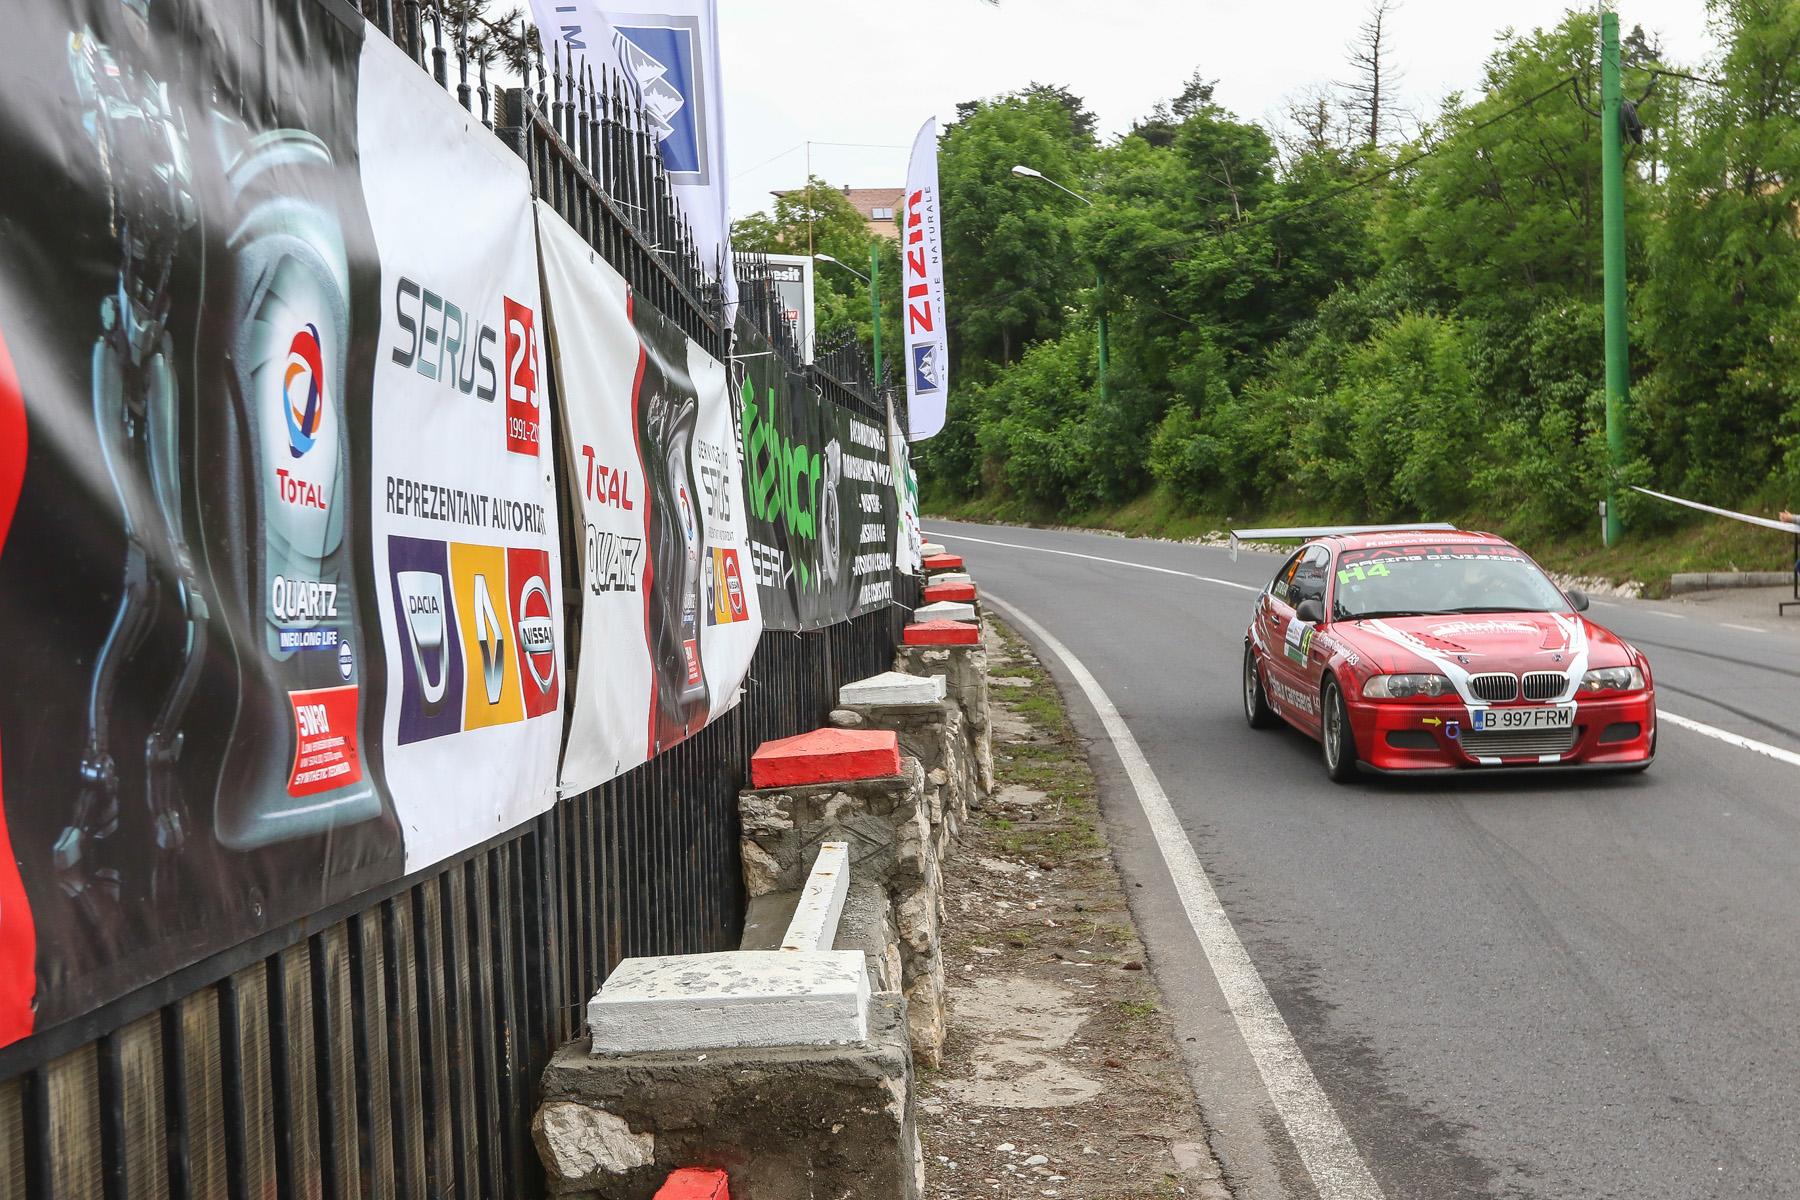 Promo Rally TOTAL powered by SDS încheie anul la Hărman